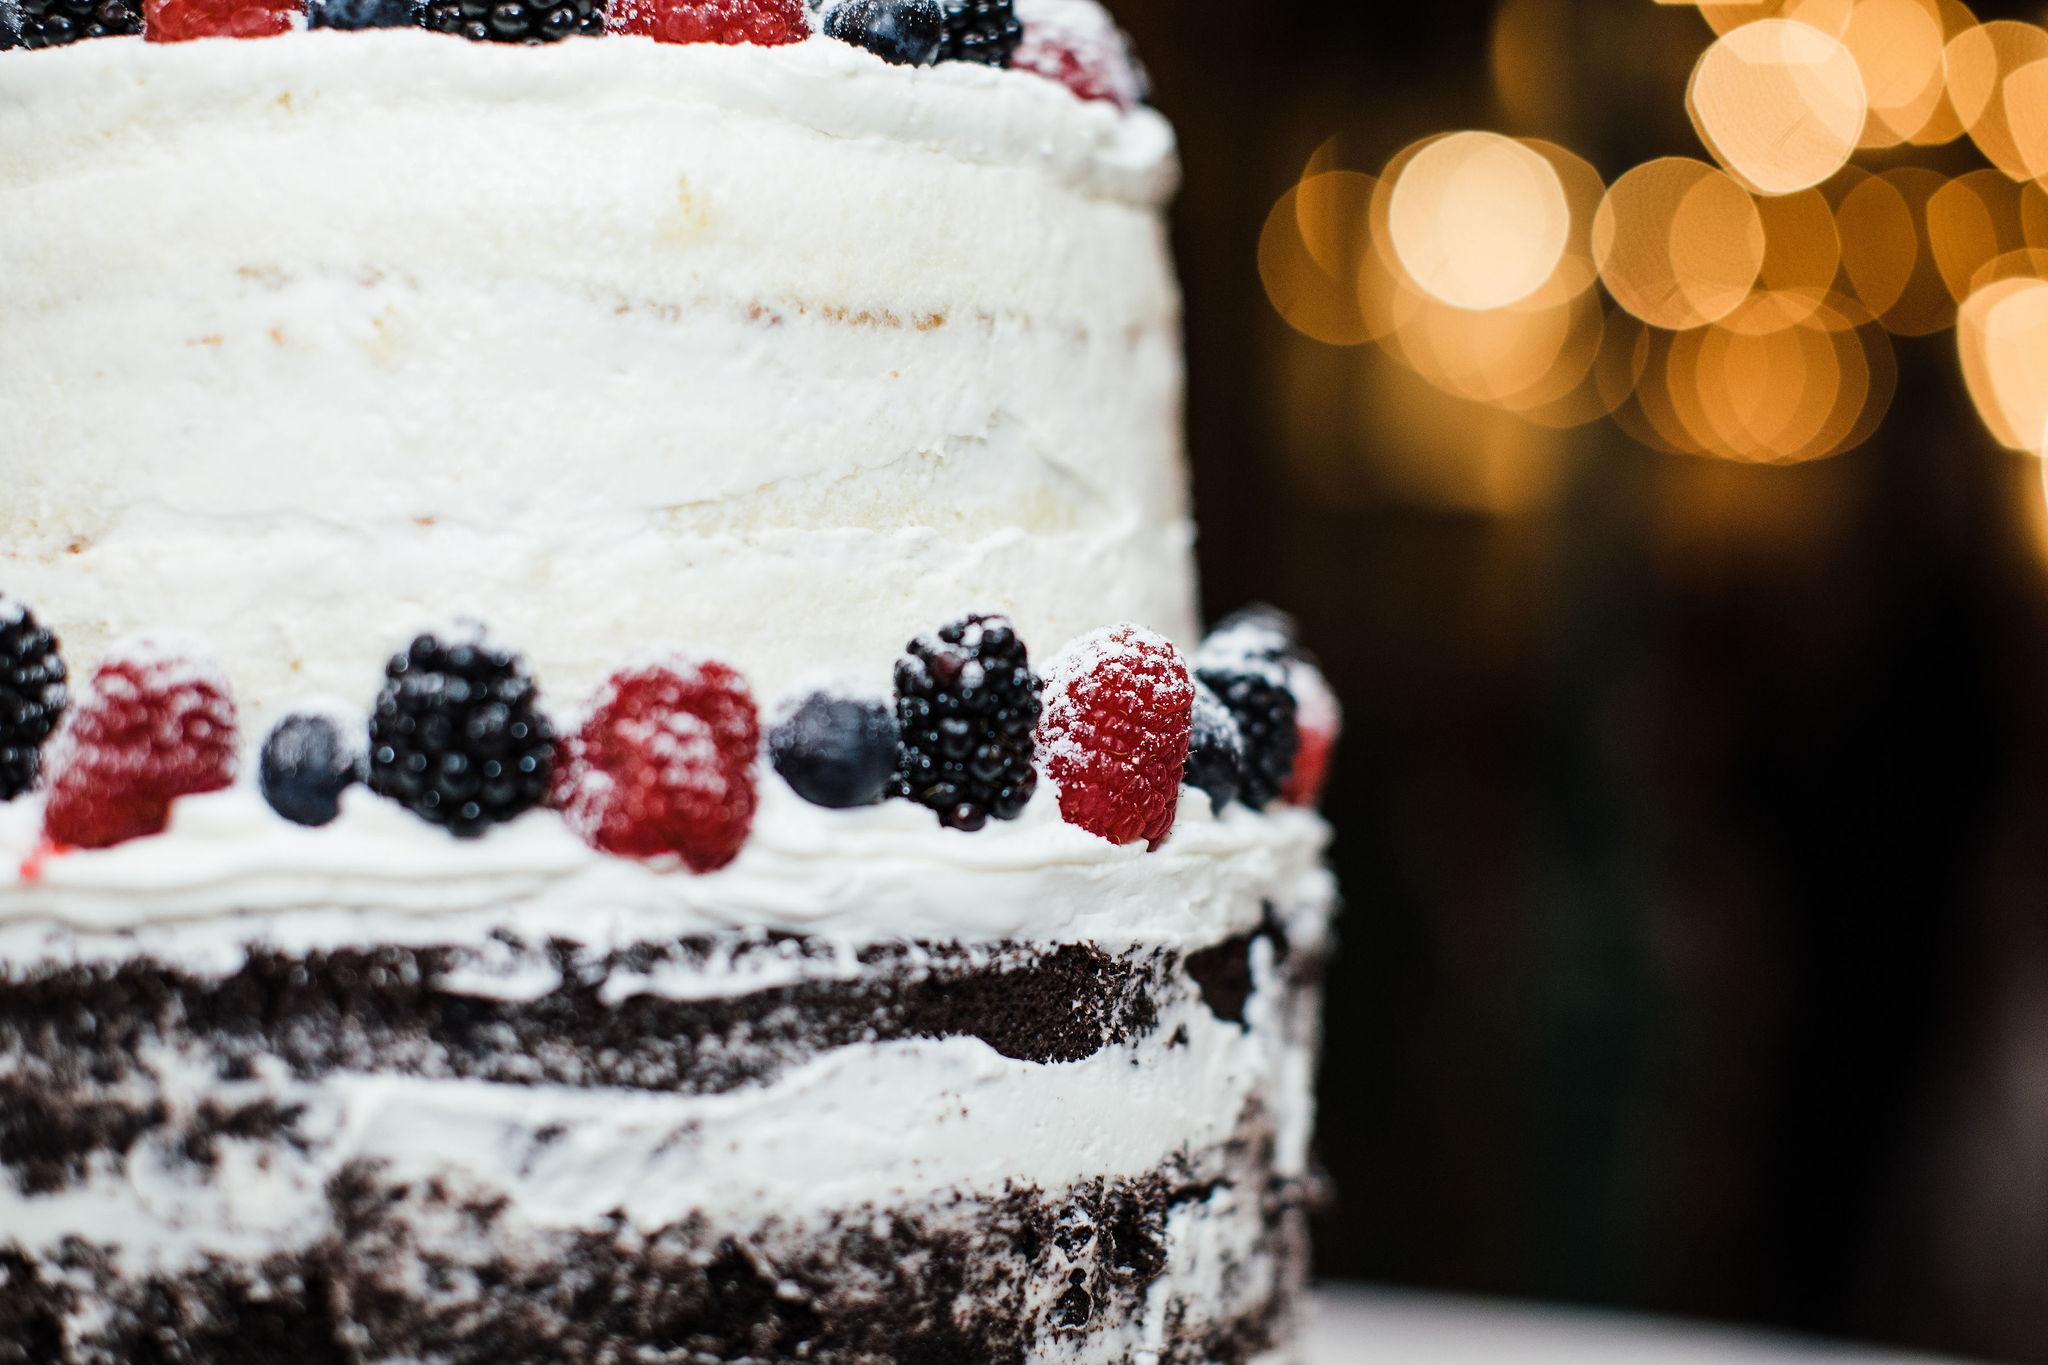 wedding cakes pensacola florida.jpg